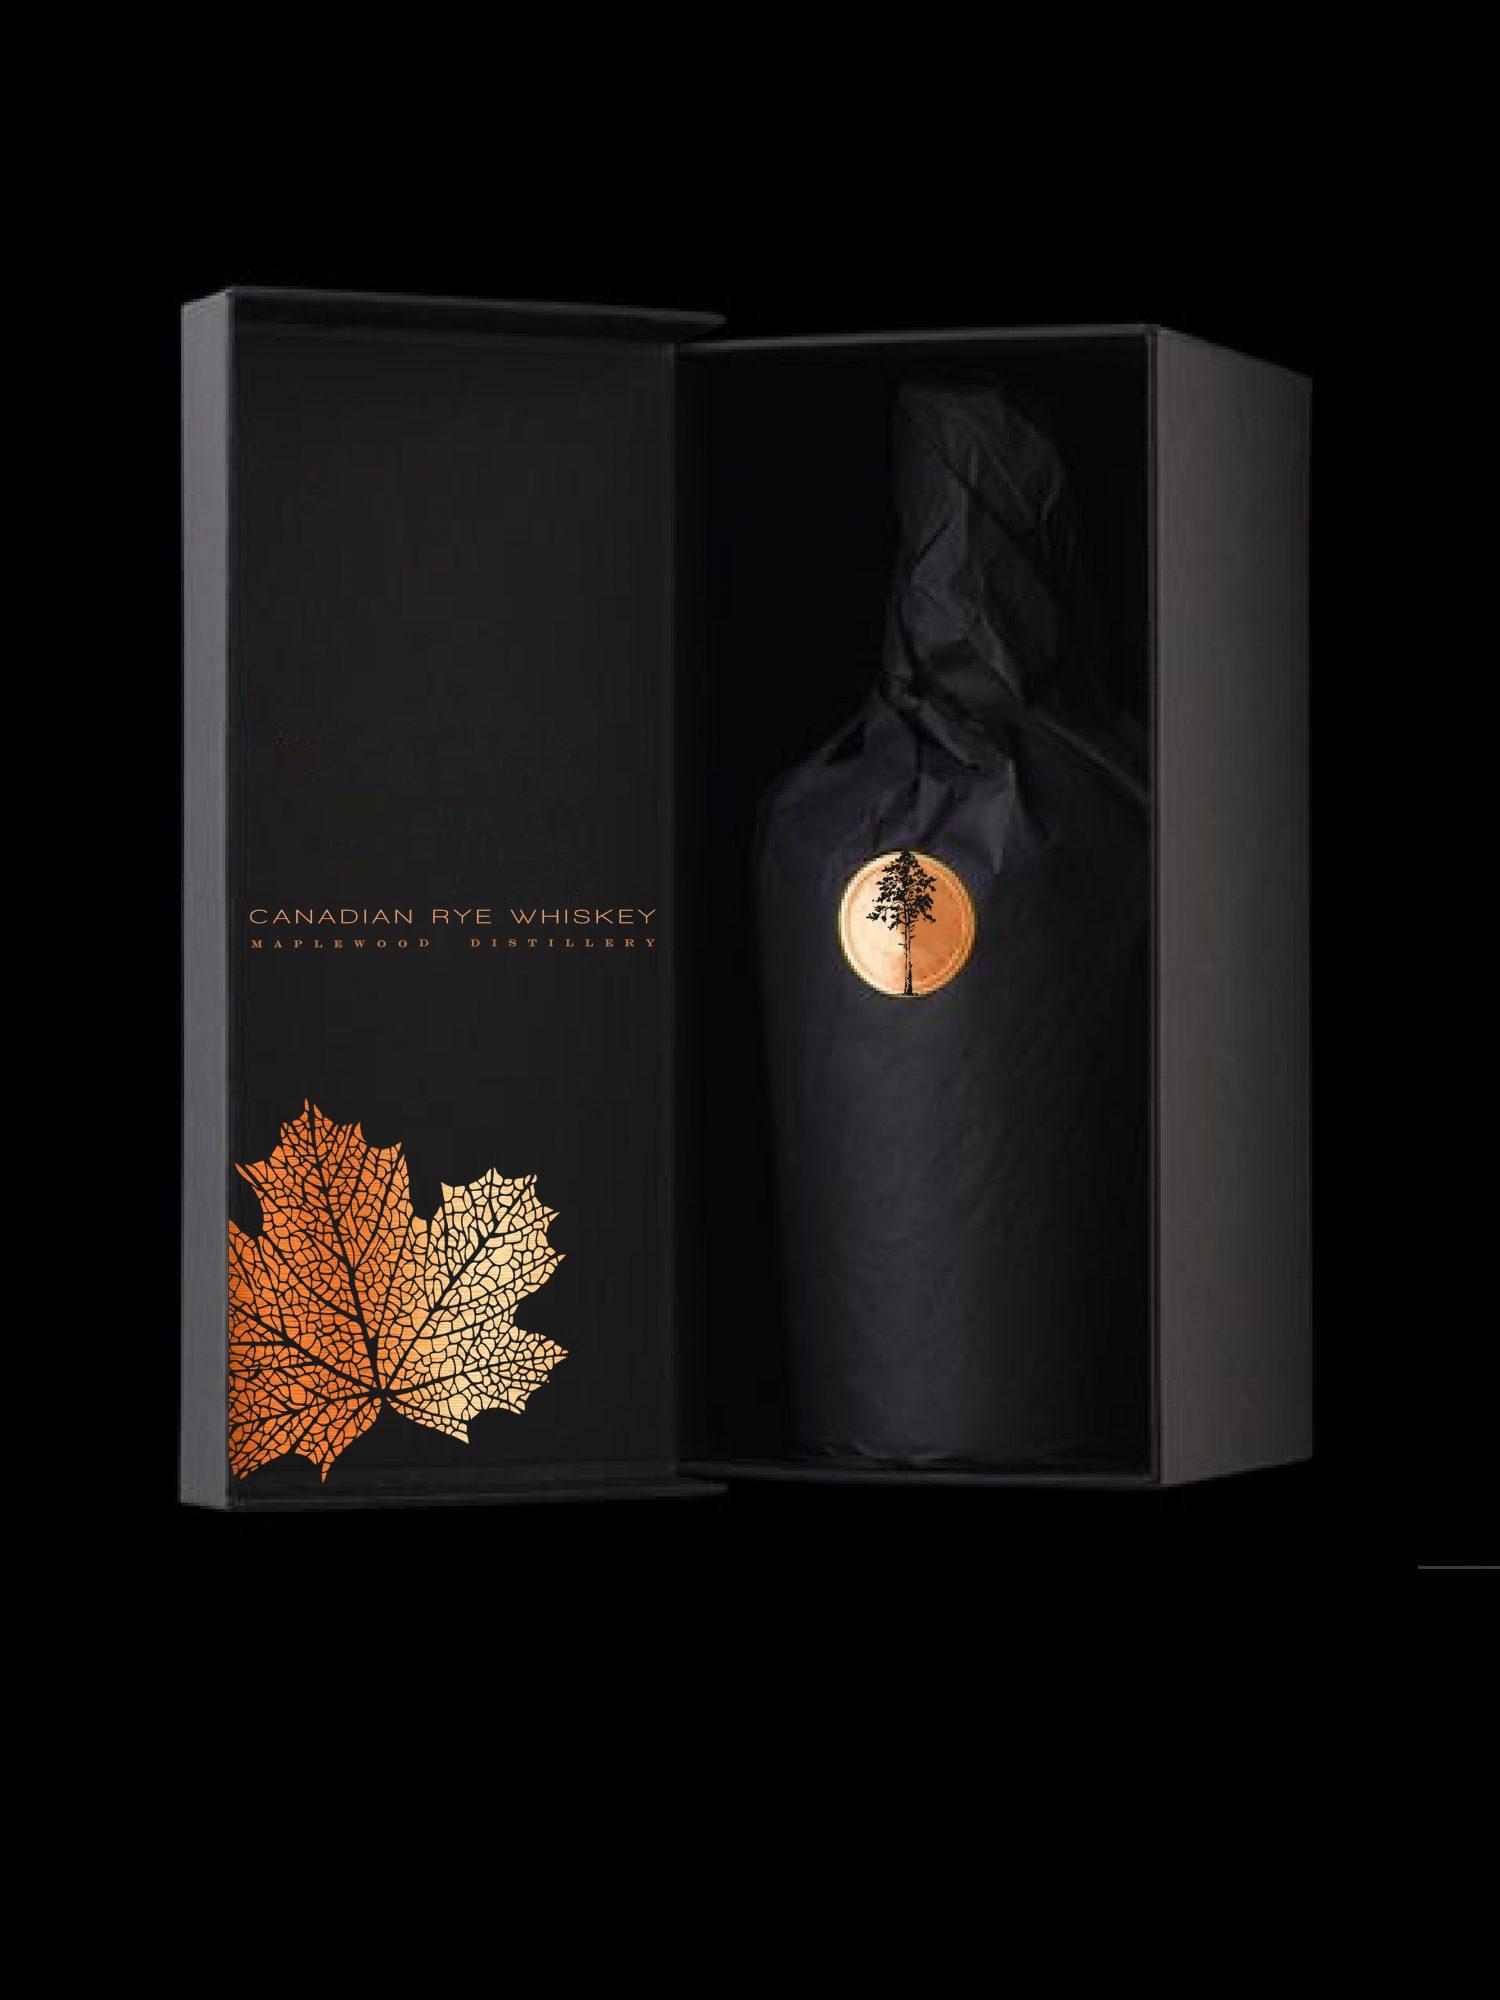 Oliver-Spence-Maplewood-Distillery-Packaging-inside